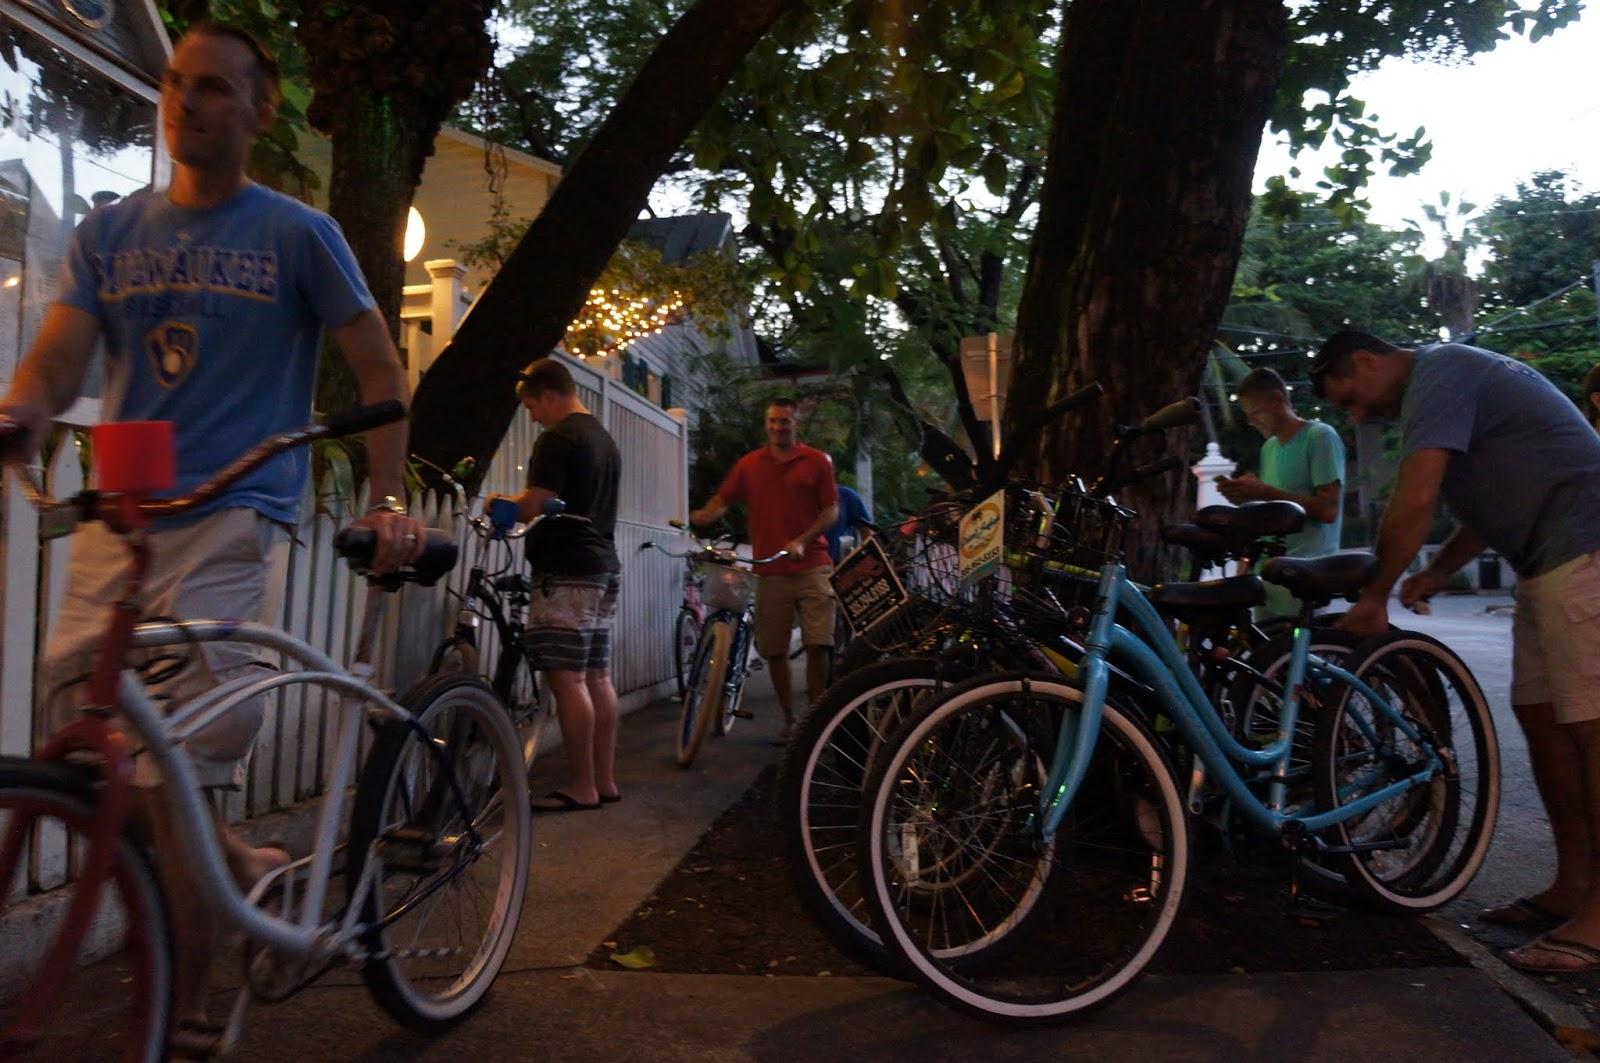 Bicycling in Key West, Bikes in Key West